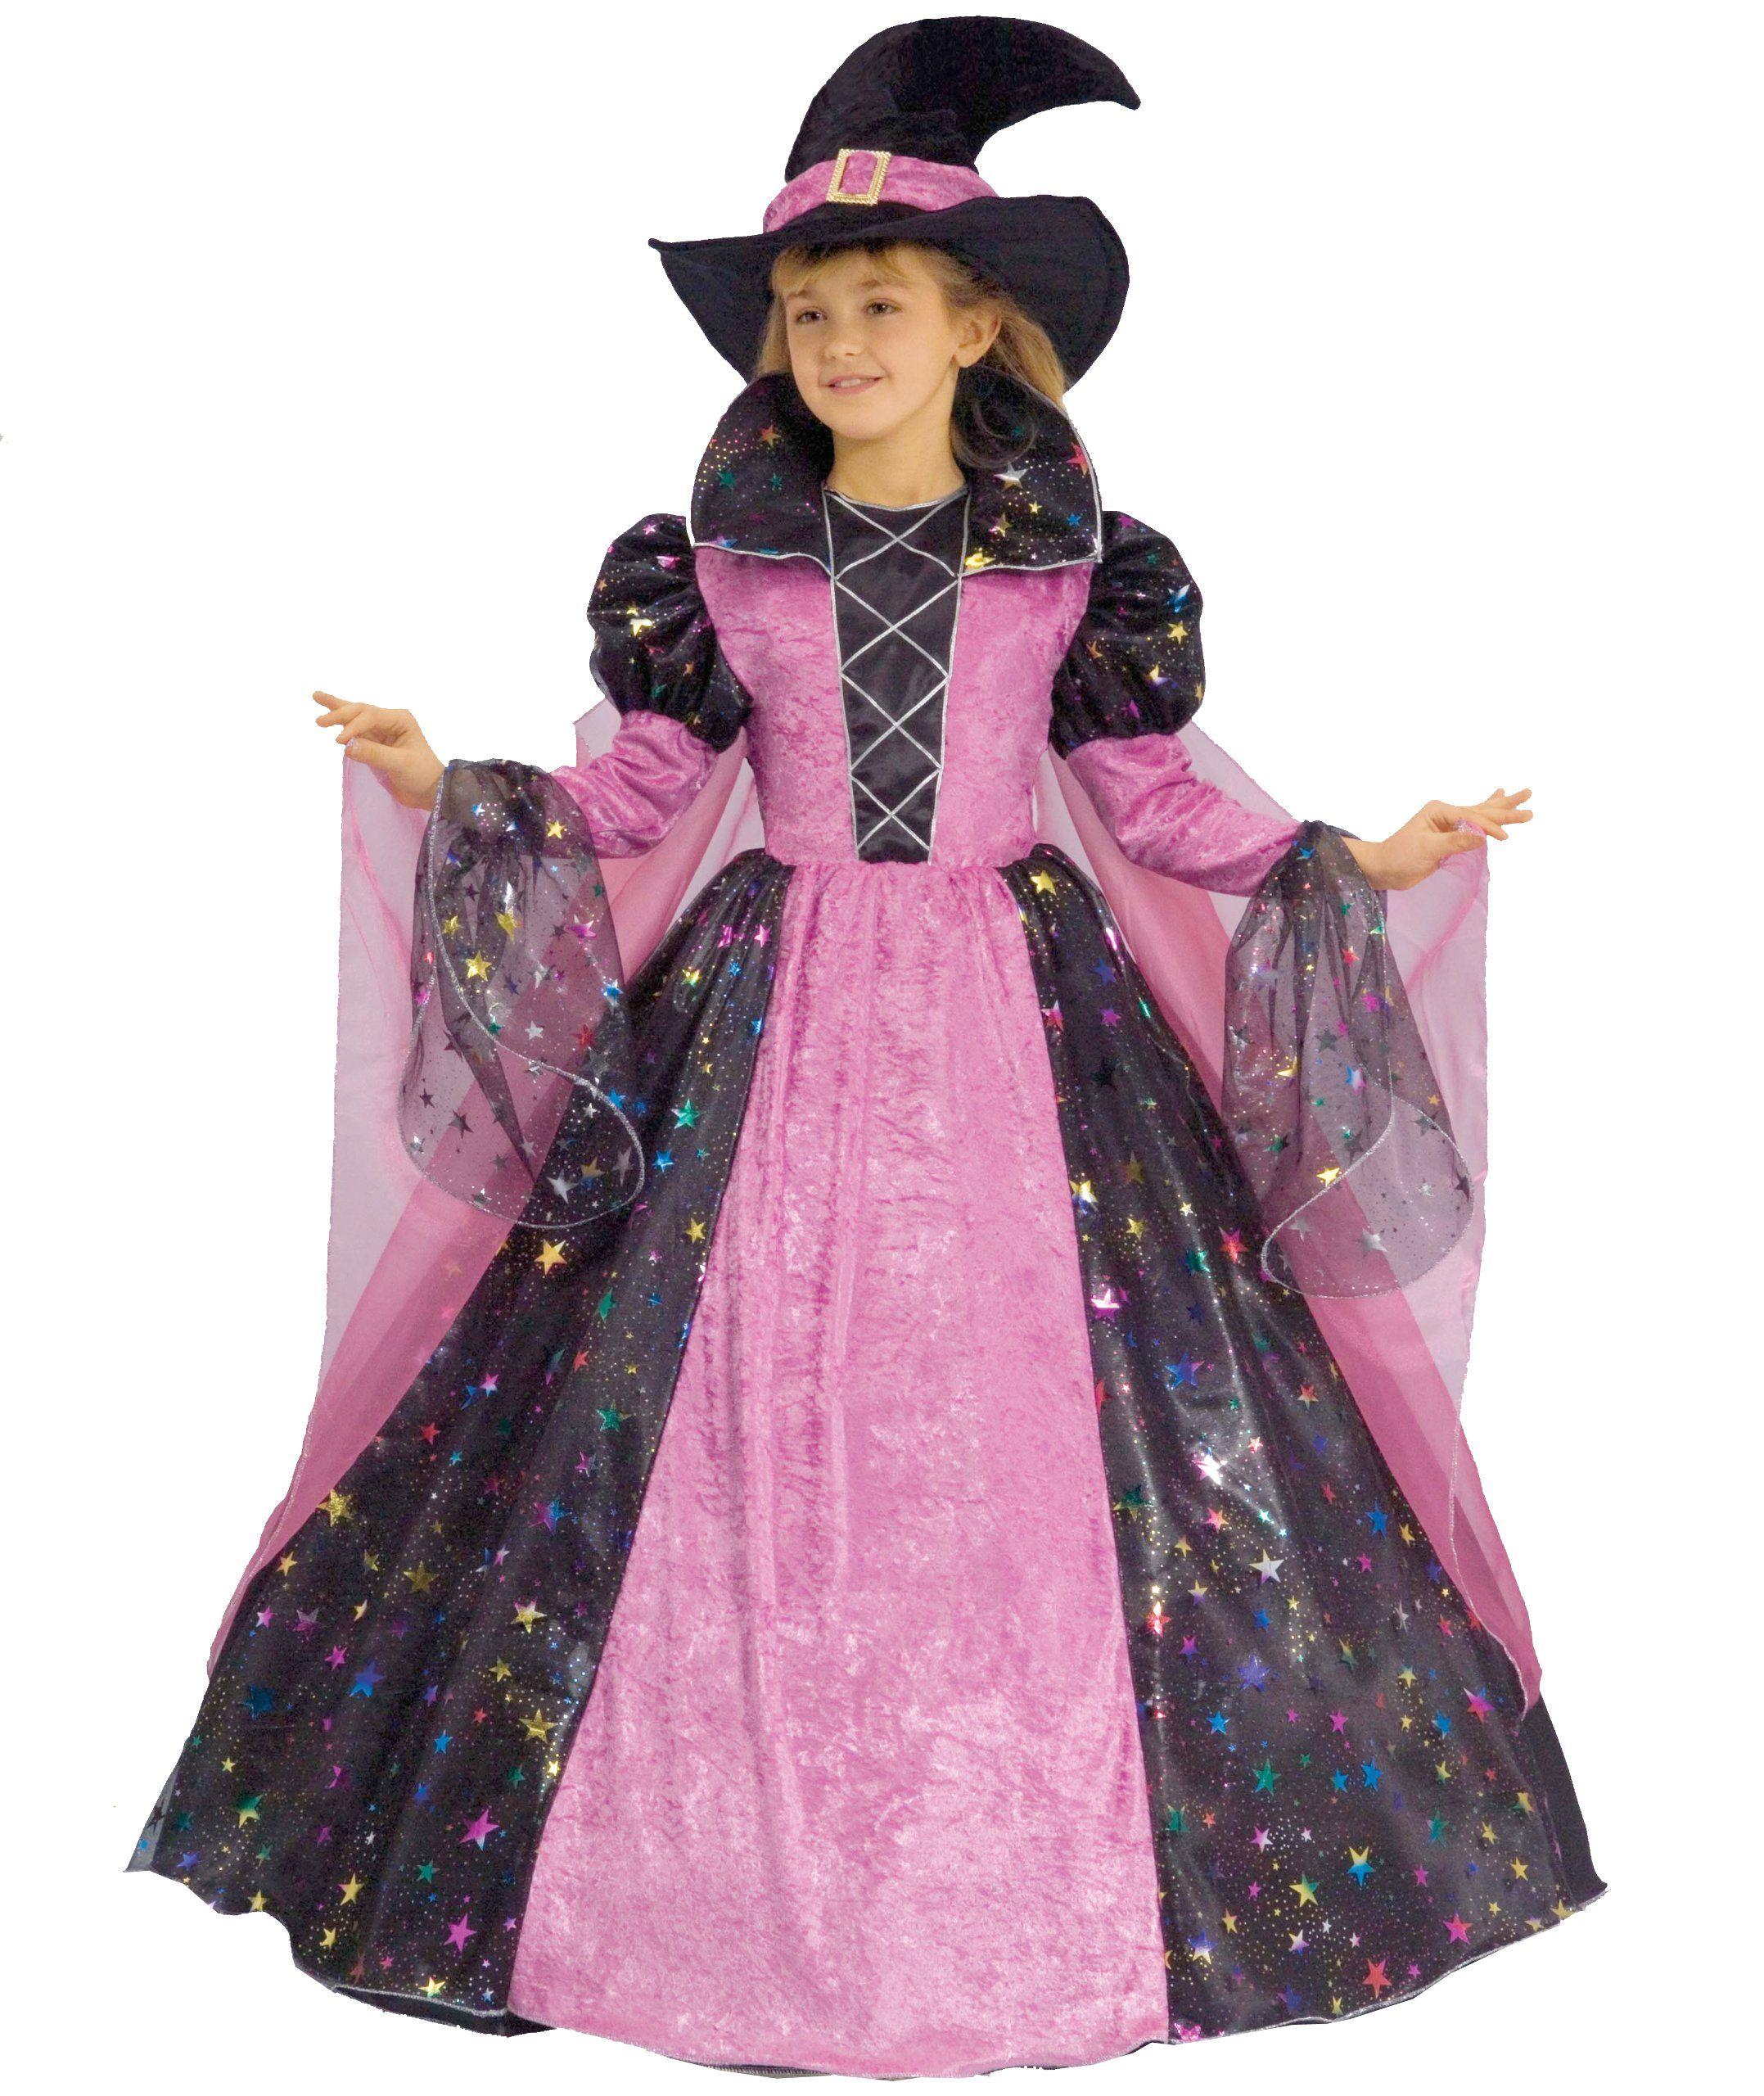 Dress Up America Bruja deluxe, disfraz talla L, 1214